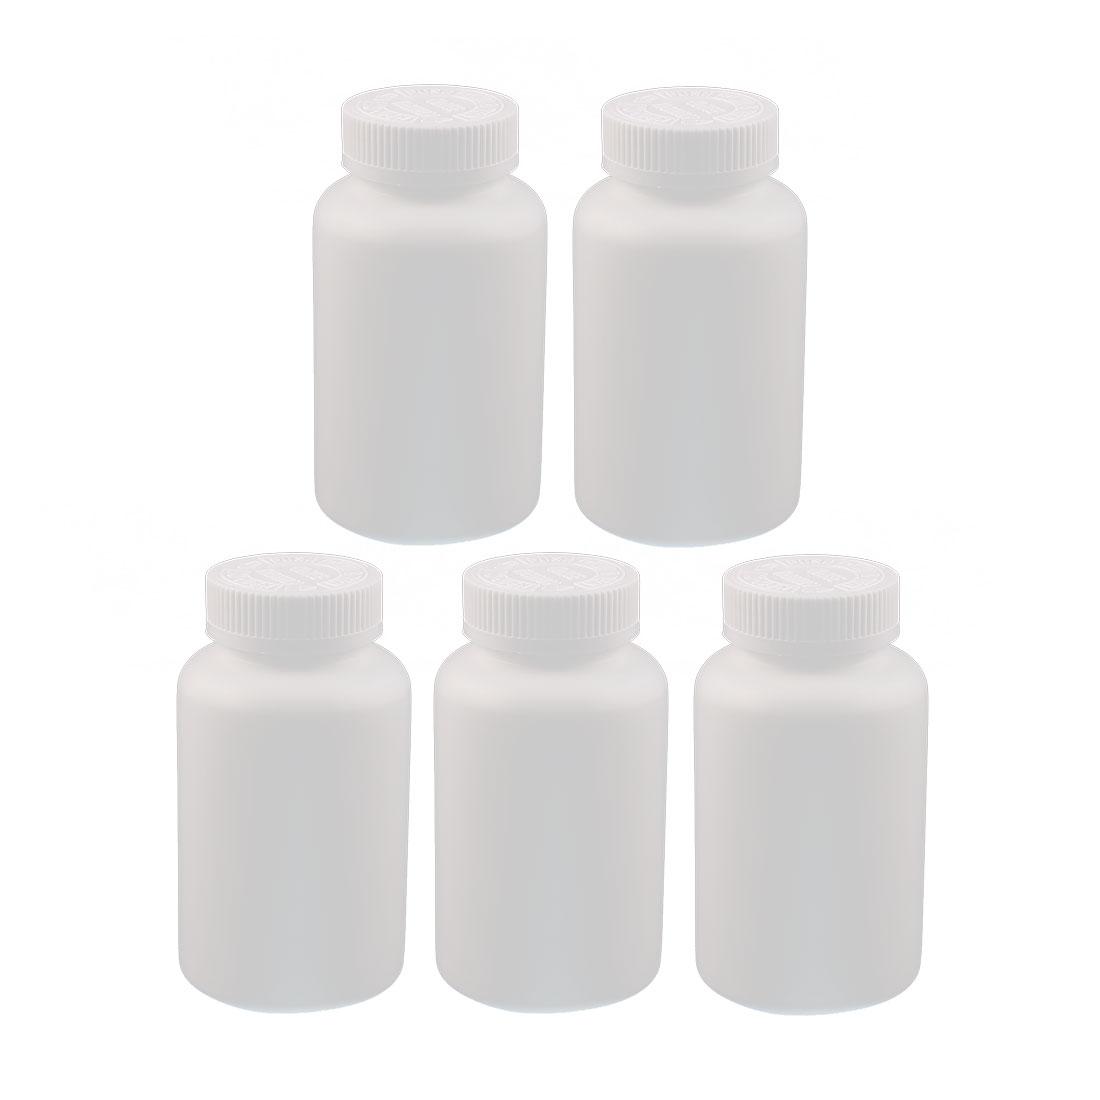 5pcs 300ml High-grade Plastic Bottle Healthy Product Round Bottle White